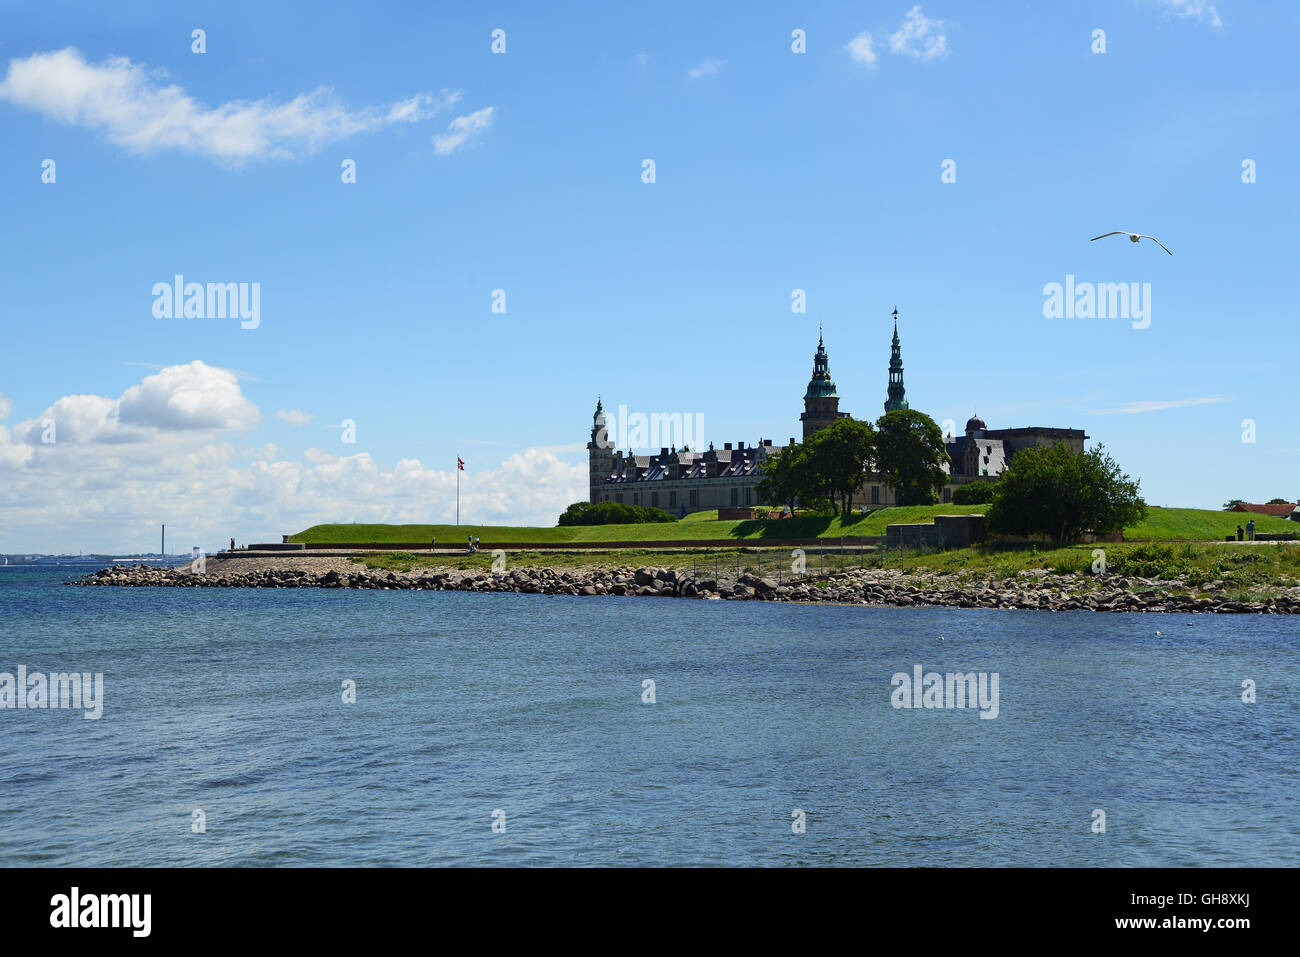 Kronborg Castle of Hamlet in Denmark - Stock Image